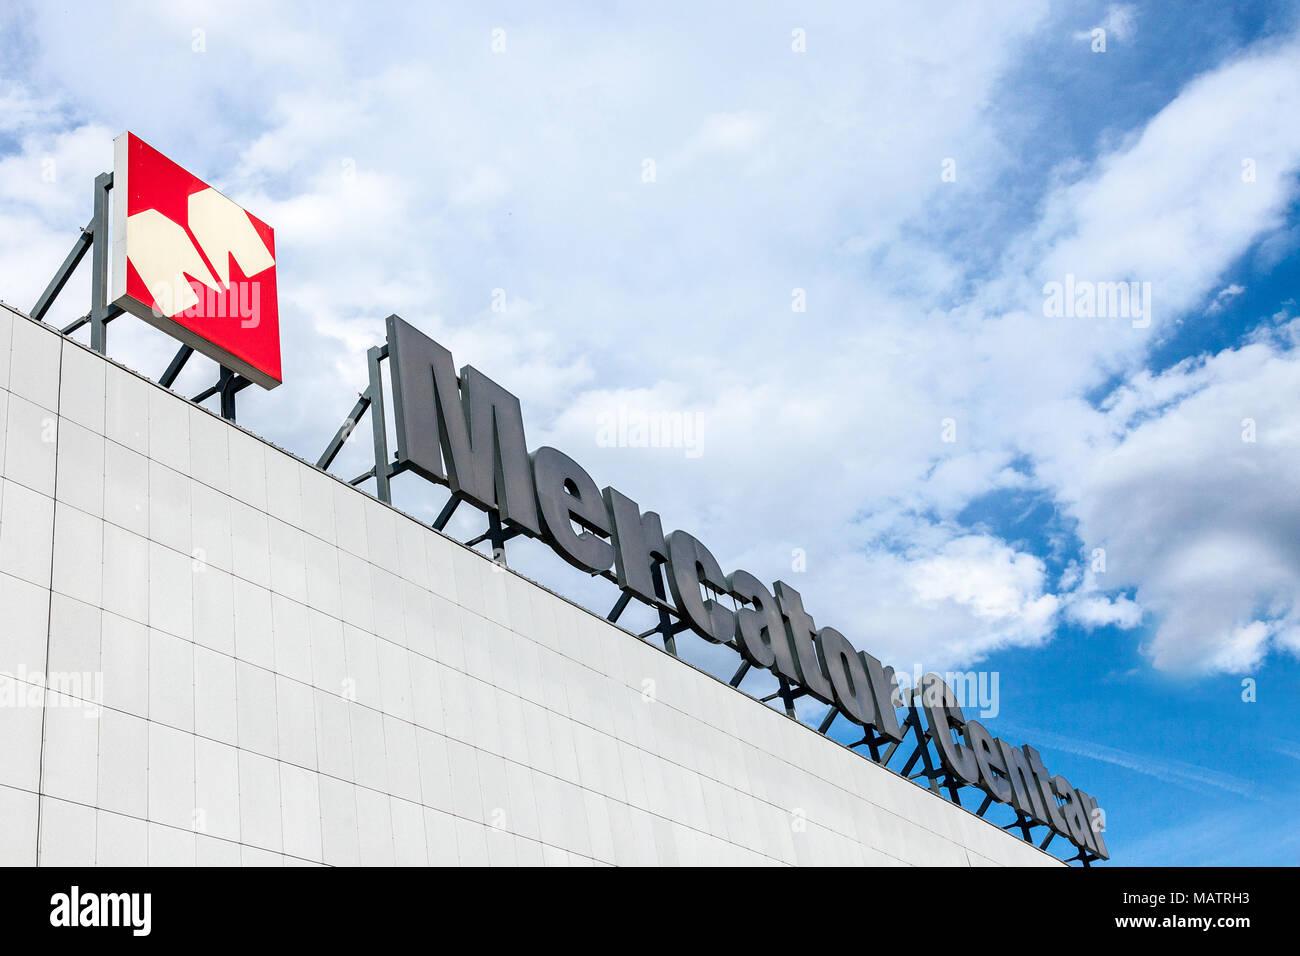 BELGRADE, SERBIA - MARCH 30, 2018: Mercator Center Supermarket with its logo, Mercator is a Slovenian Supermarket brand belonging to the Croatian Grou - Stock Image